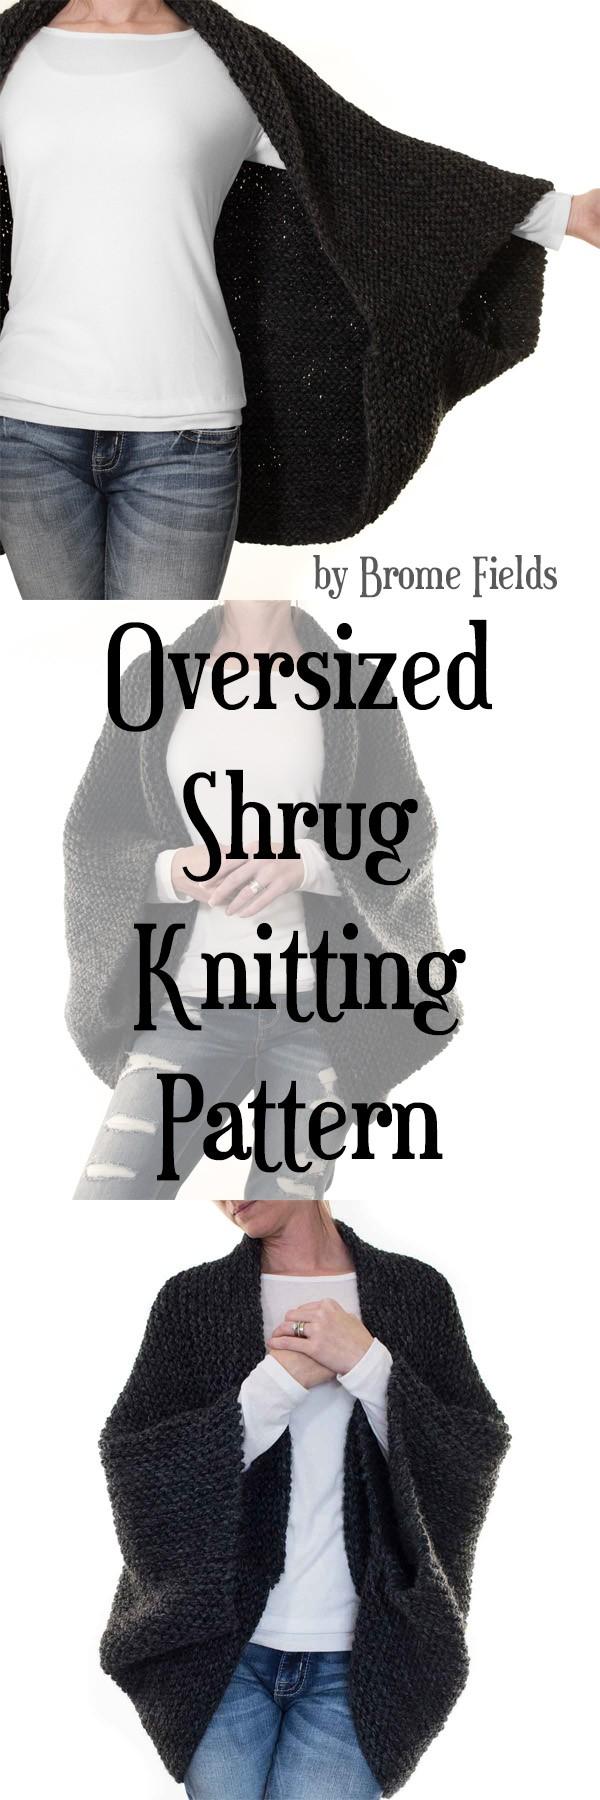 Oversized Shrug Knitting Pattern by Brome Fields